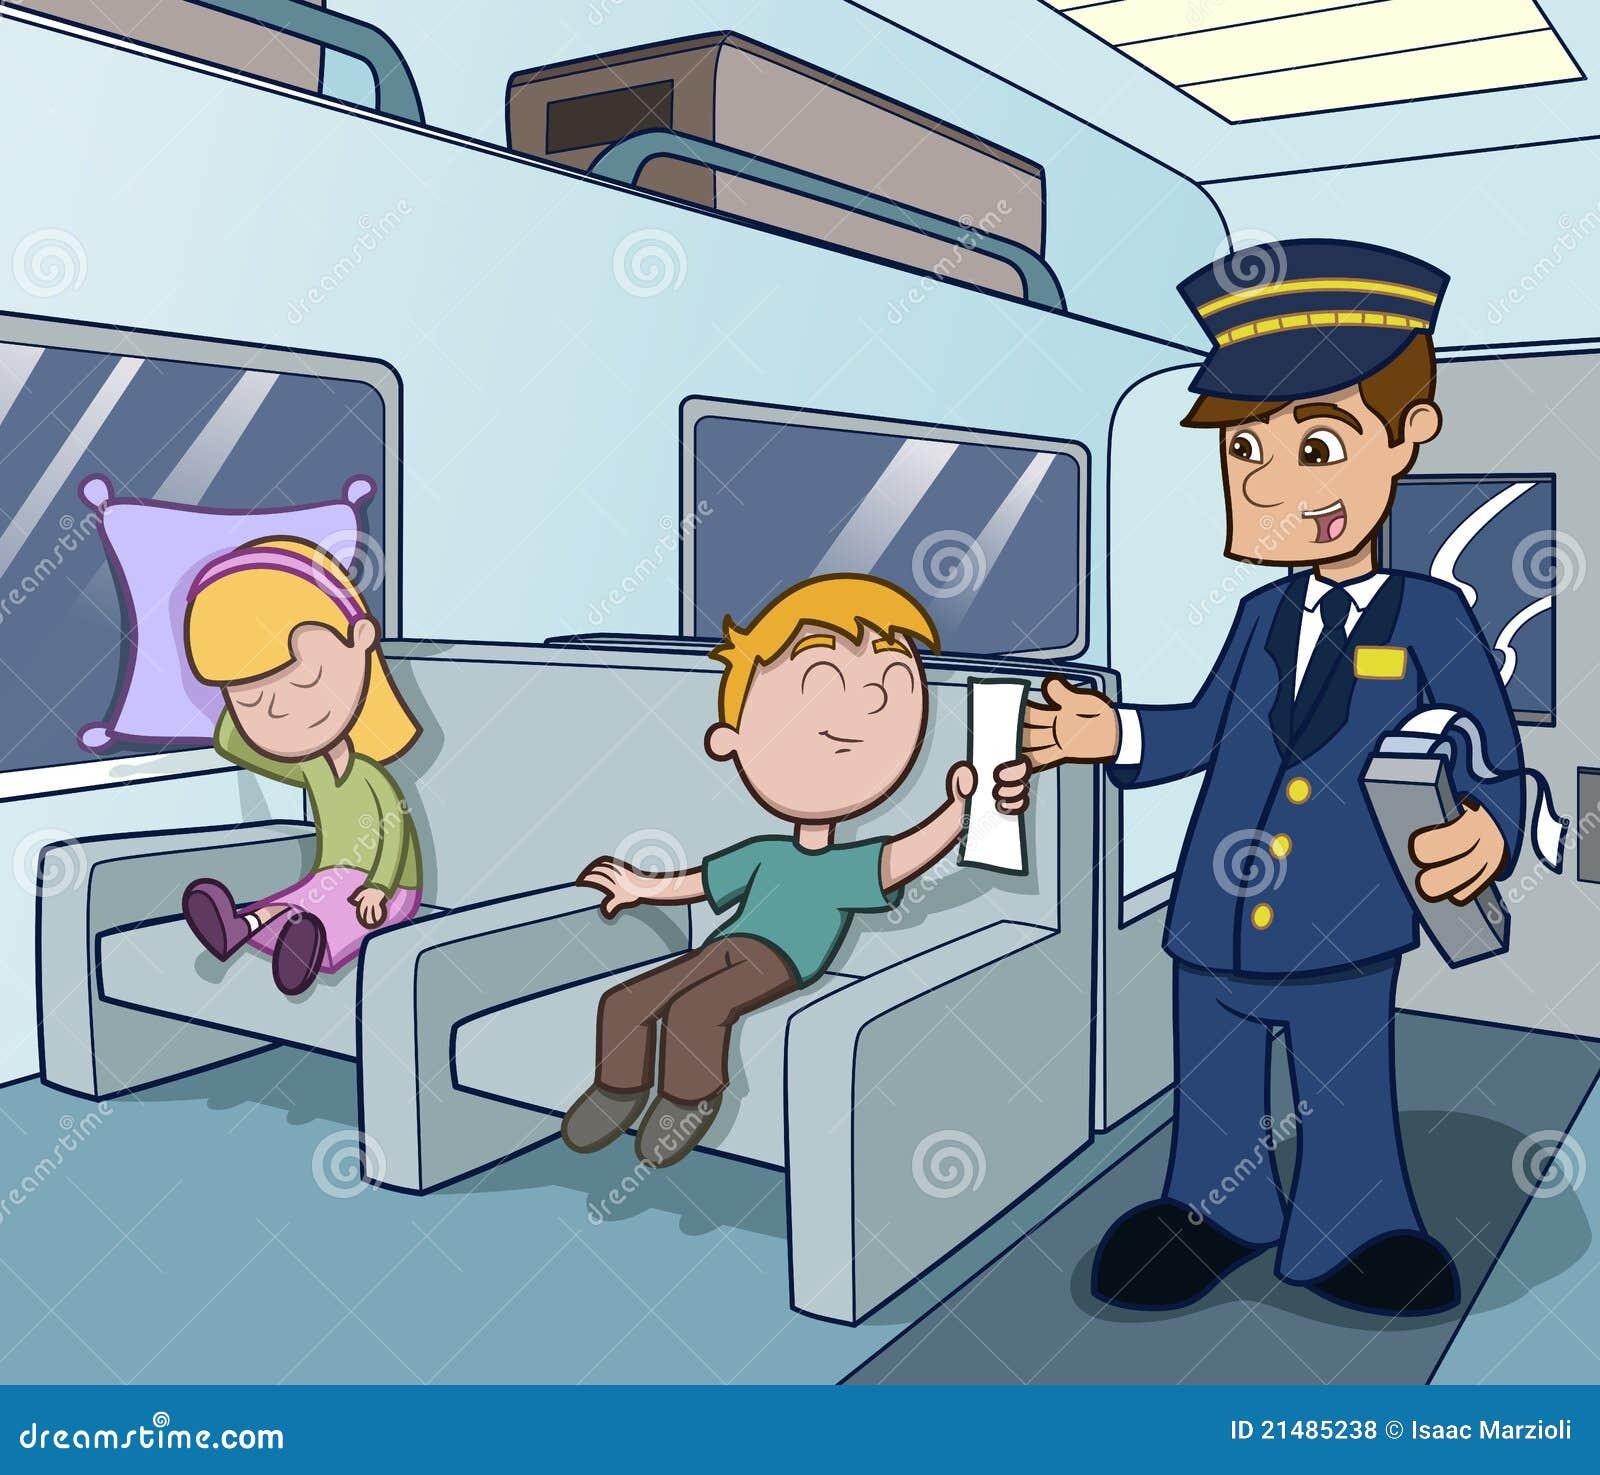 clipart of train conductors - photo #7